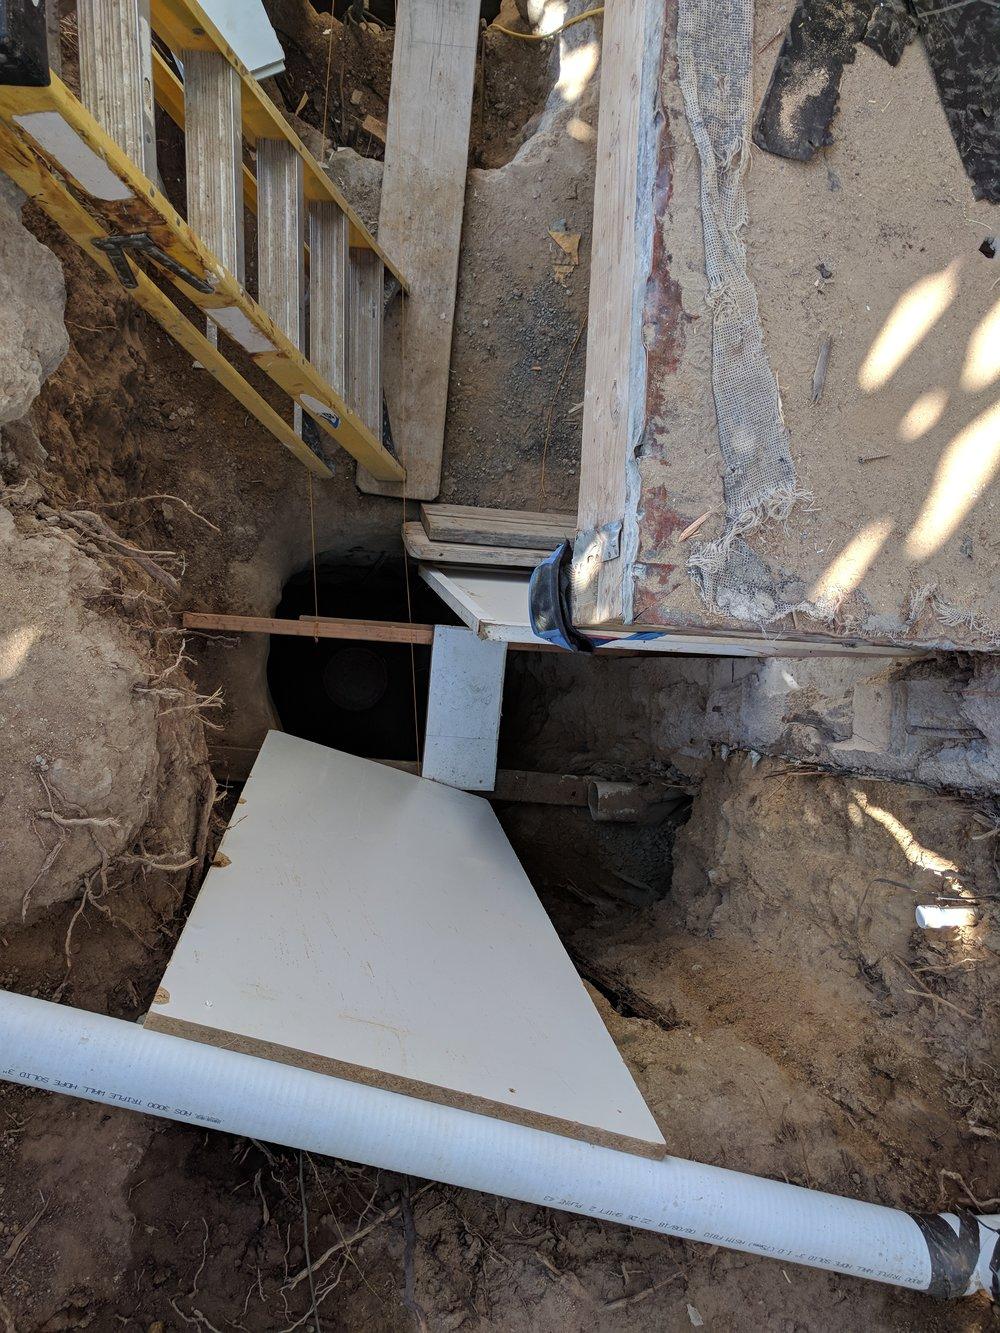 Foundation prep-10 foot deep caissons-ready for concrete.